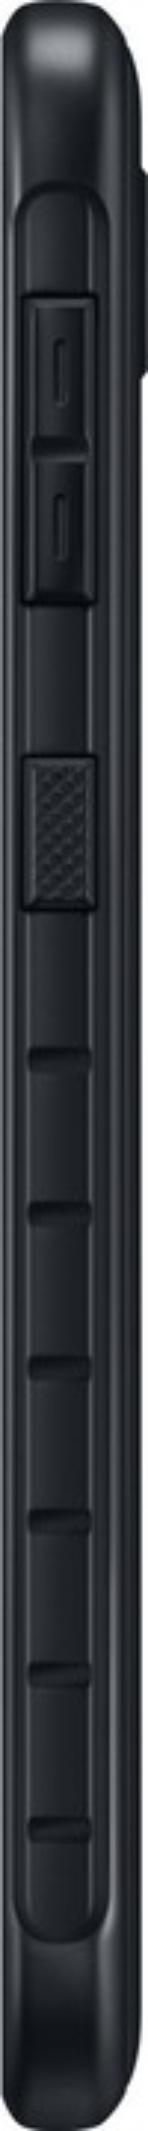 Samsung Galaxy Xcover 5 render leak 1